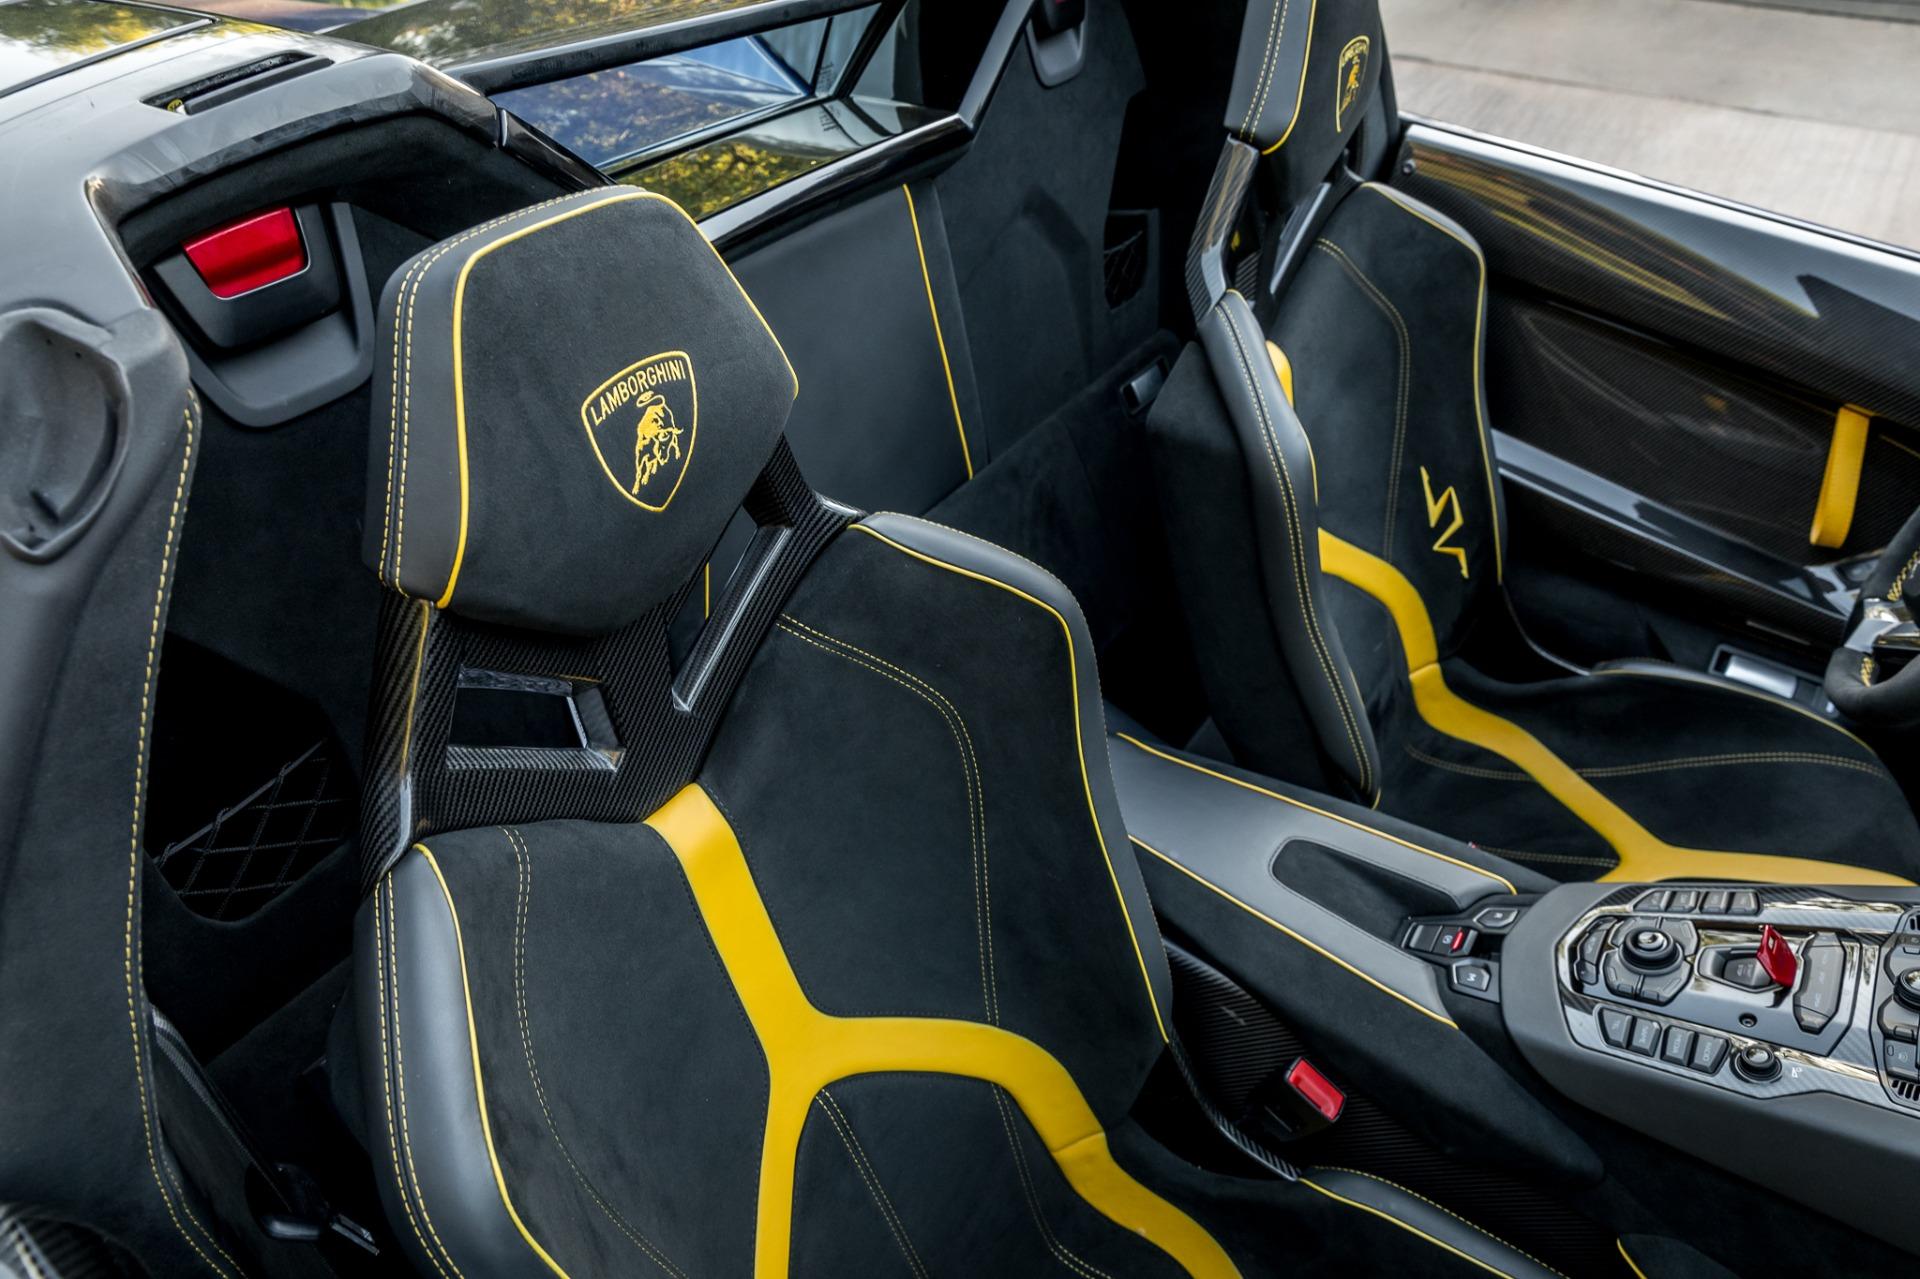 Used 2017 Lamborghini Aventador LP 750-4 SV / 740HP / AWD / 1930 MI / NAV / CAMERA for sale Sold at Formula Imports in Charlotte NC 28227 16